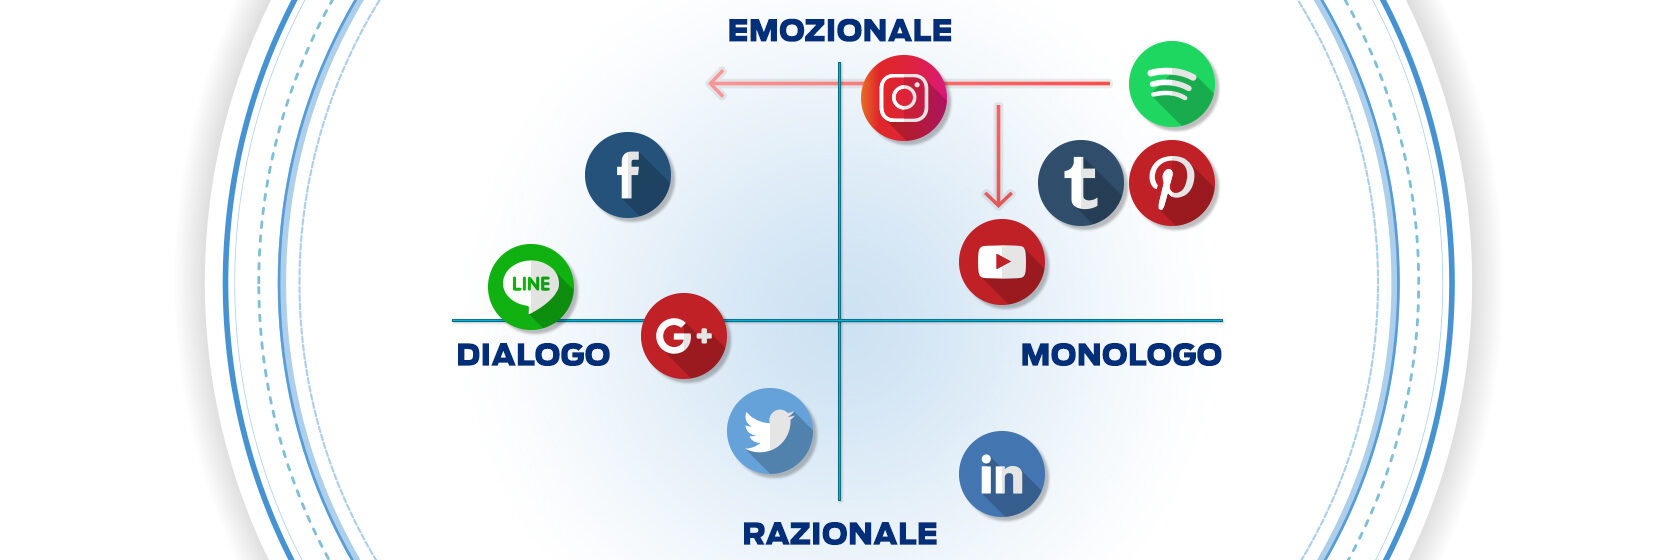 social_network-emozionali-dialogo